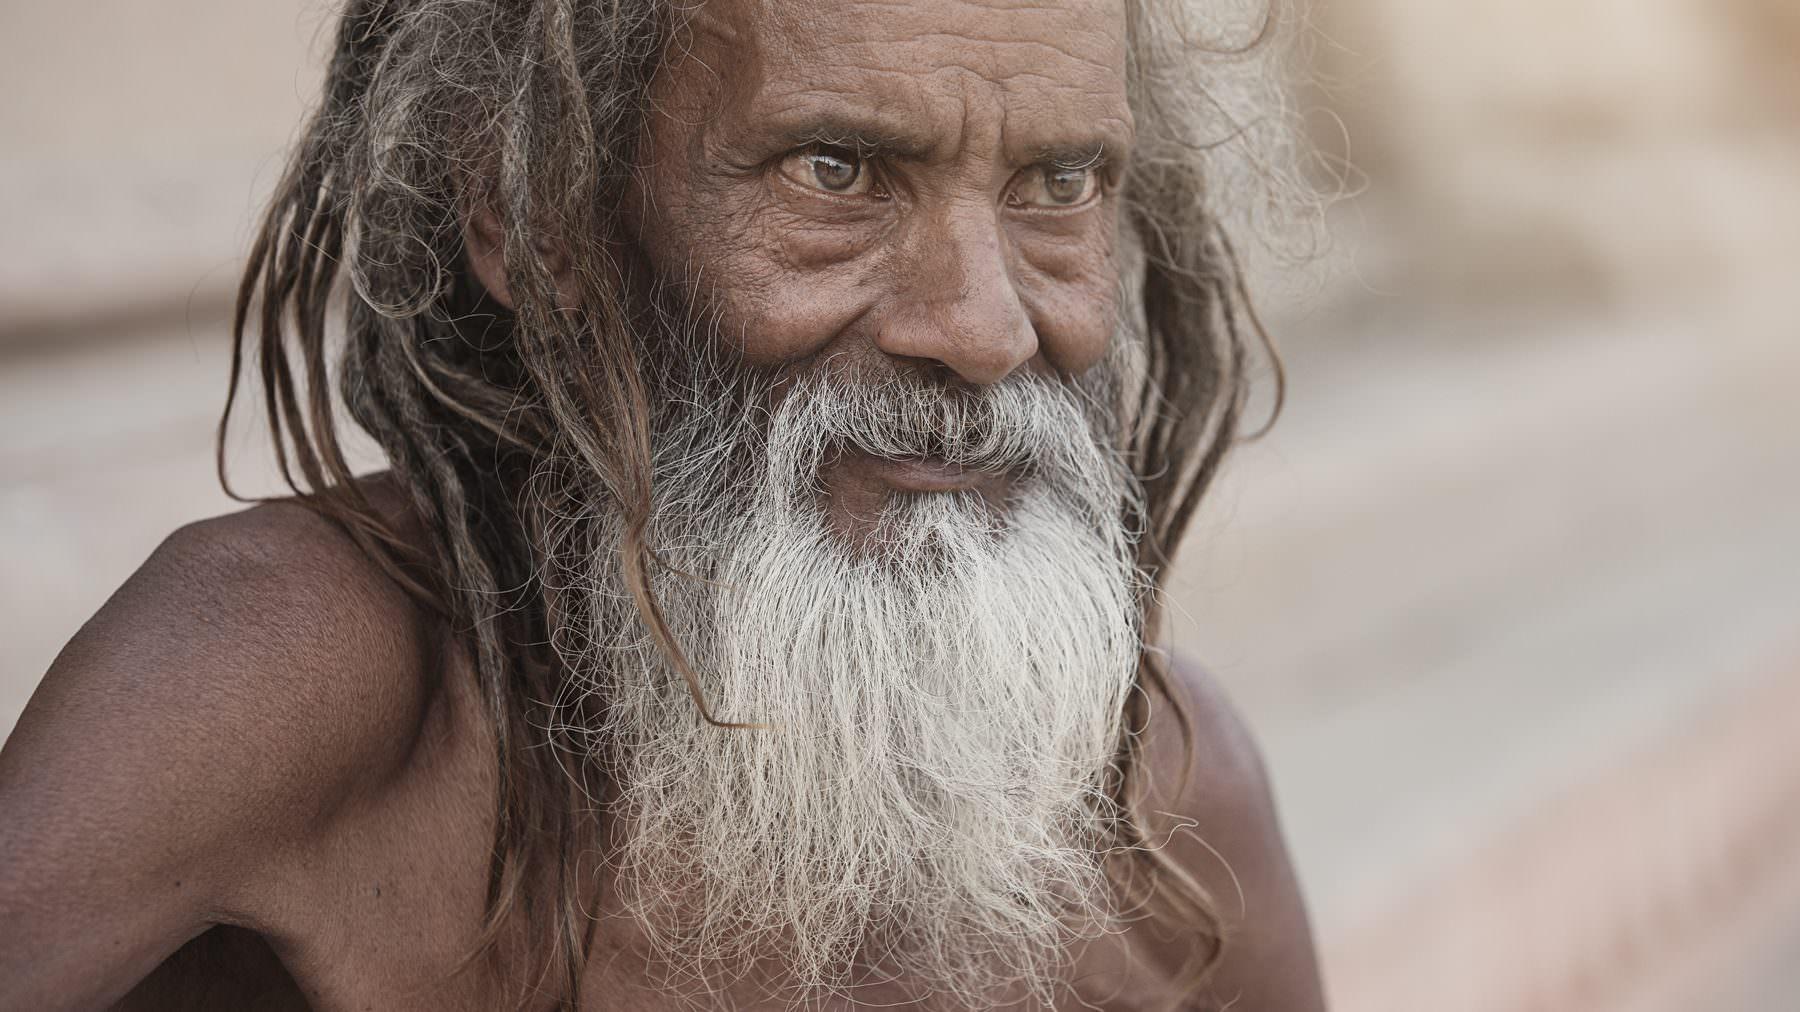 India, Varanasi, Ganga, old Sadhu